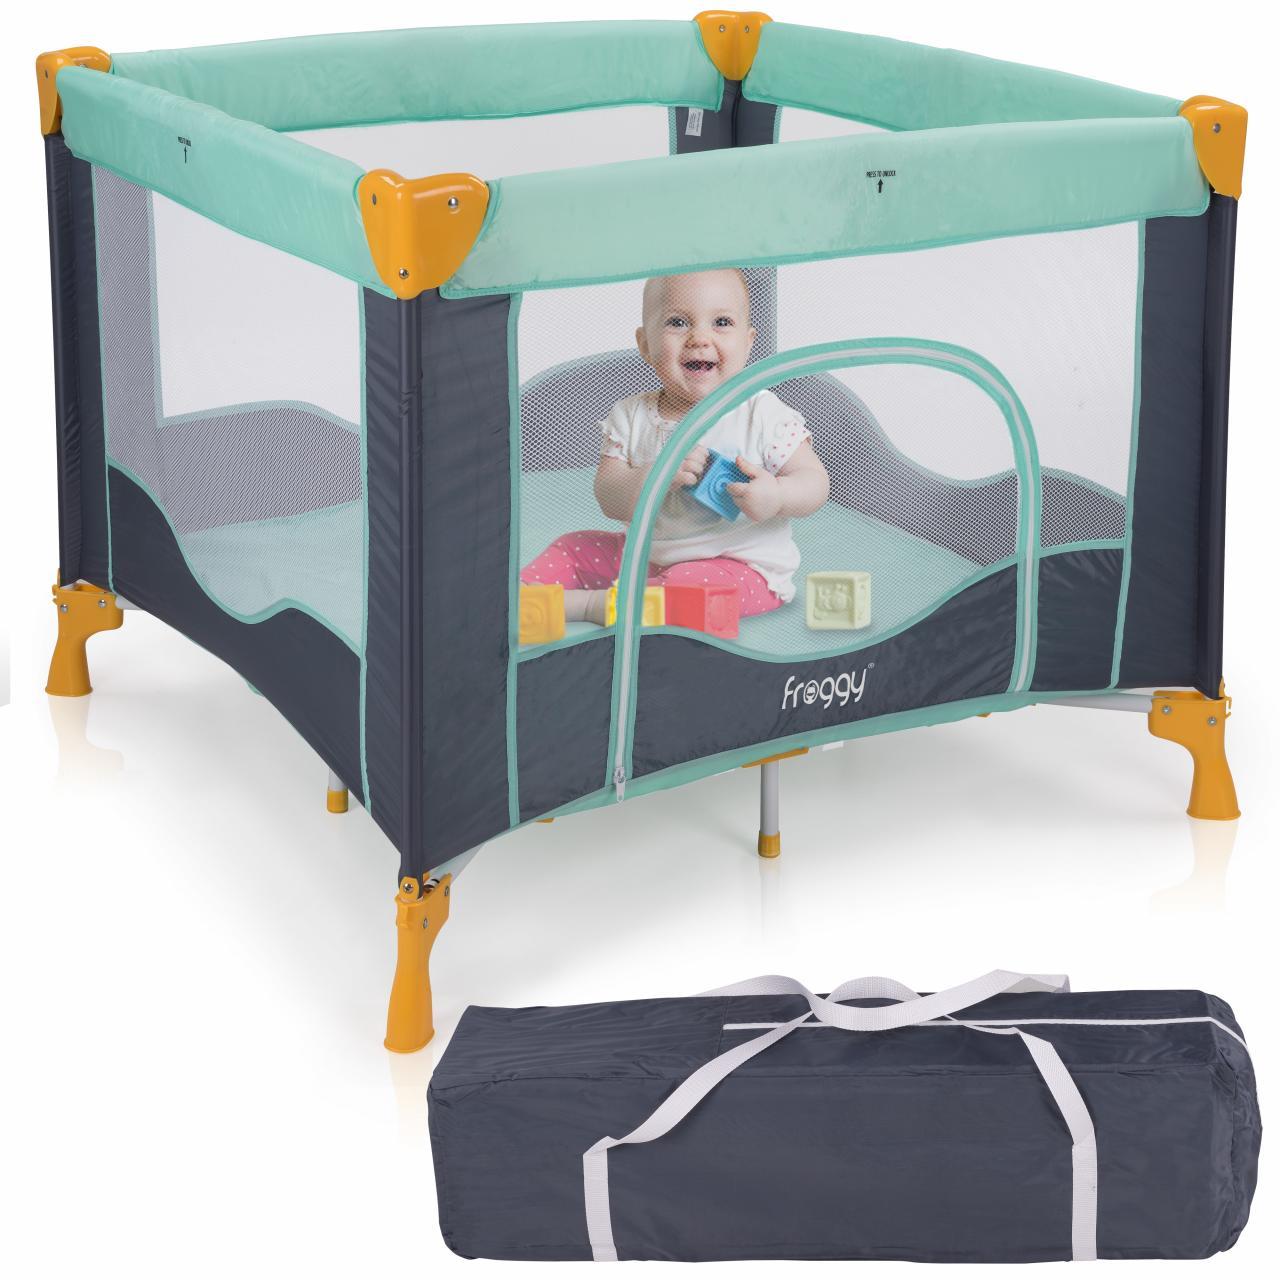 Reisebett-Laufstall-Babyreisebett-Spielstall-Babybett-Kinderbett-Kinderreisebett